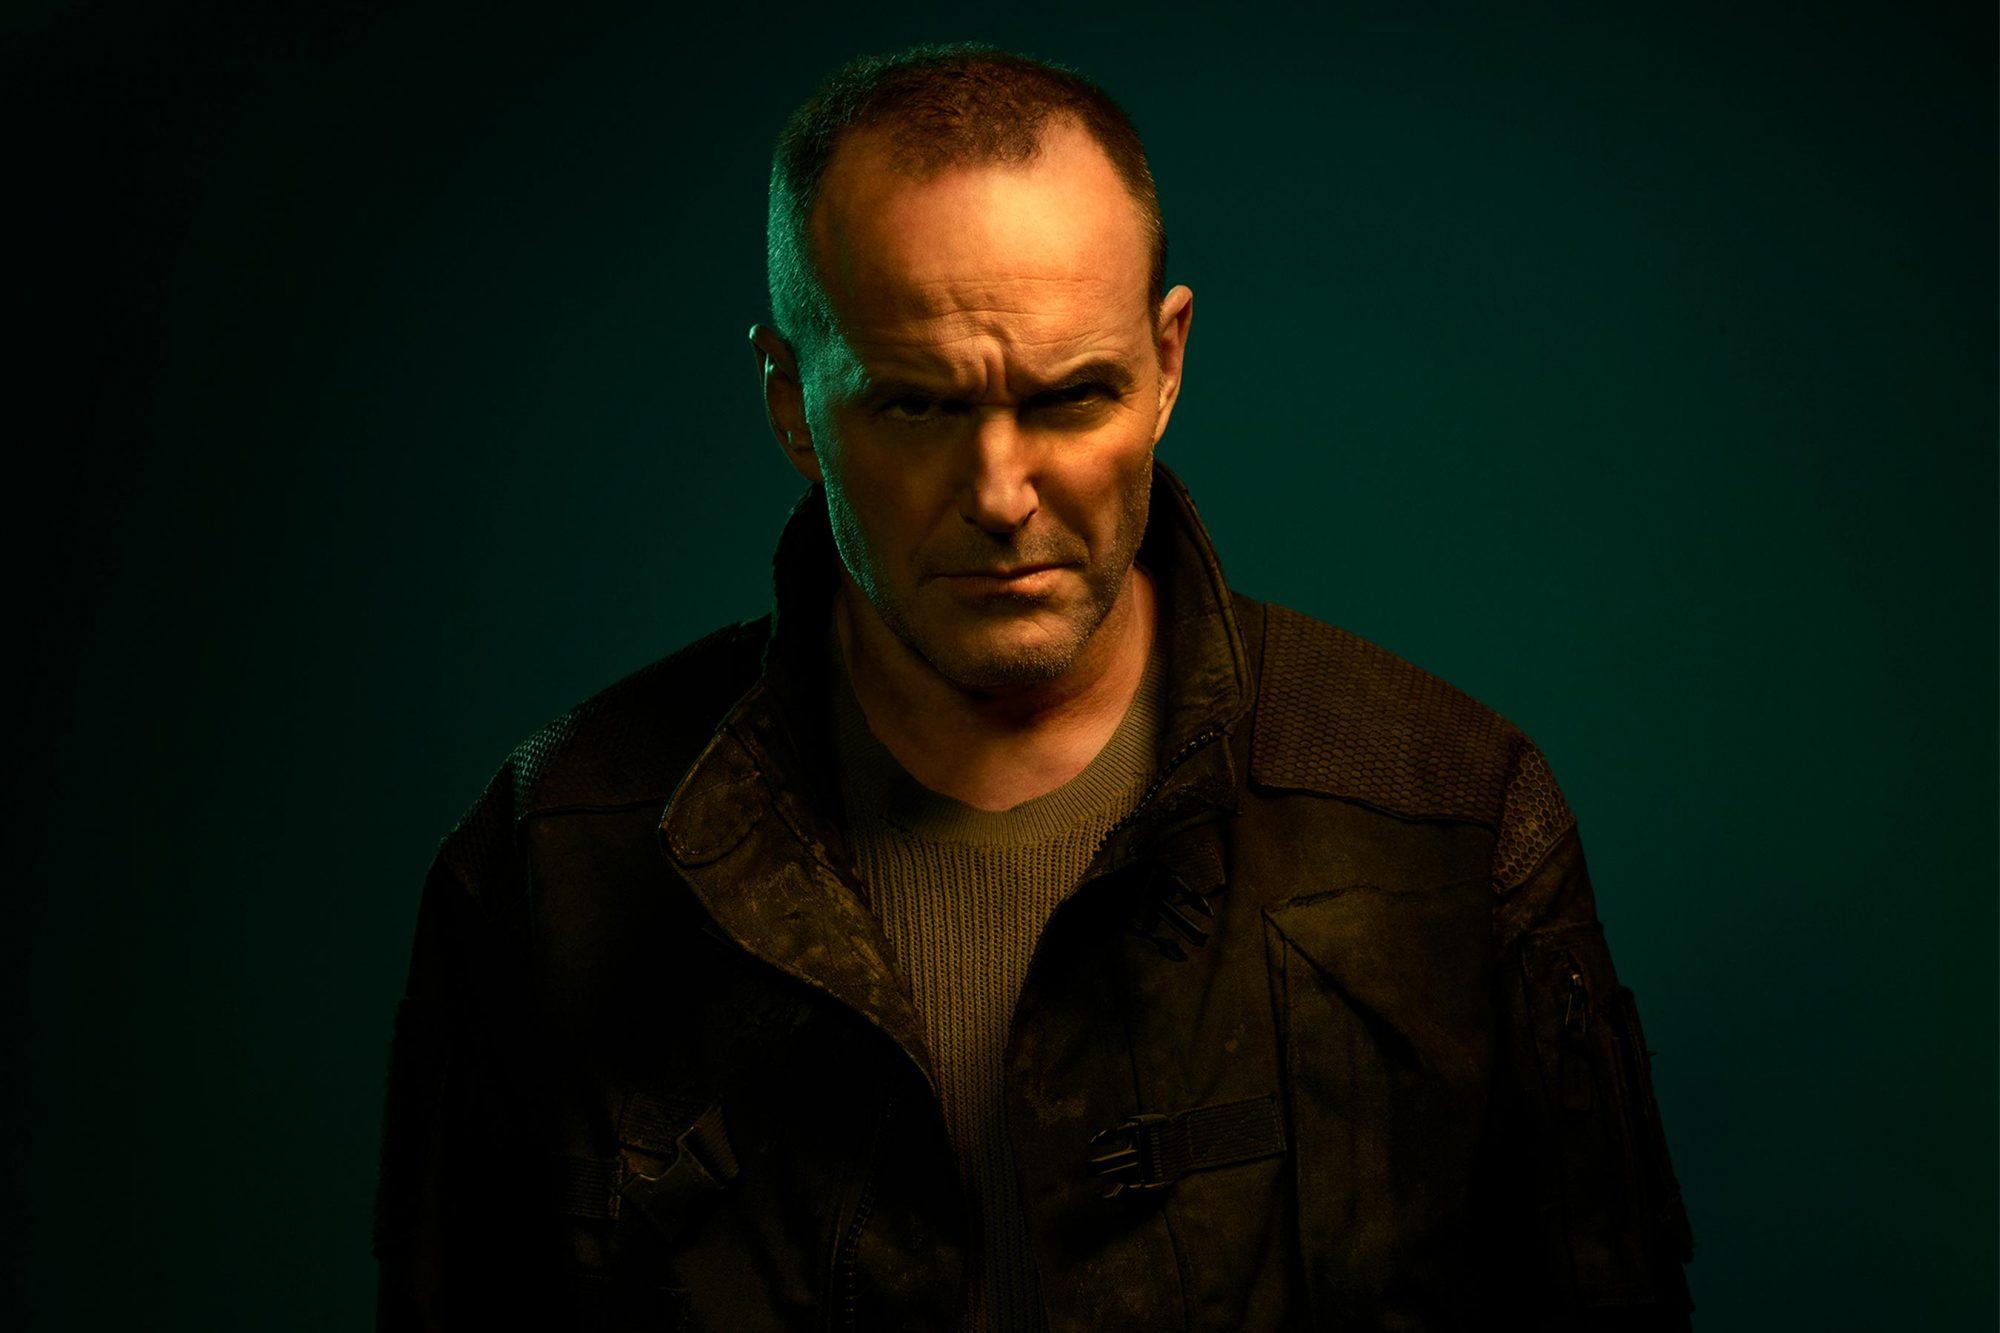 "MARVEL'S AGENTS OF S.H.I.E.L.D. - ABC's ""Marvel's Agents of S.H.I.E.L.D."" stars Clark Gregg as Sarge. (ABC/Matthias Clamer)"